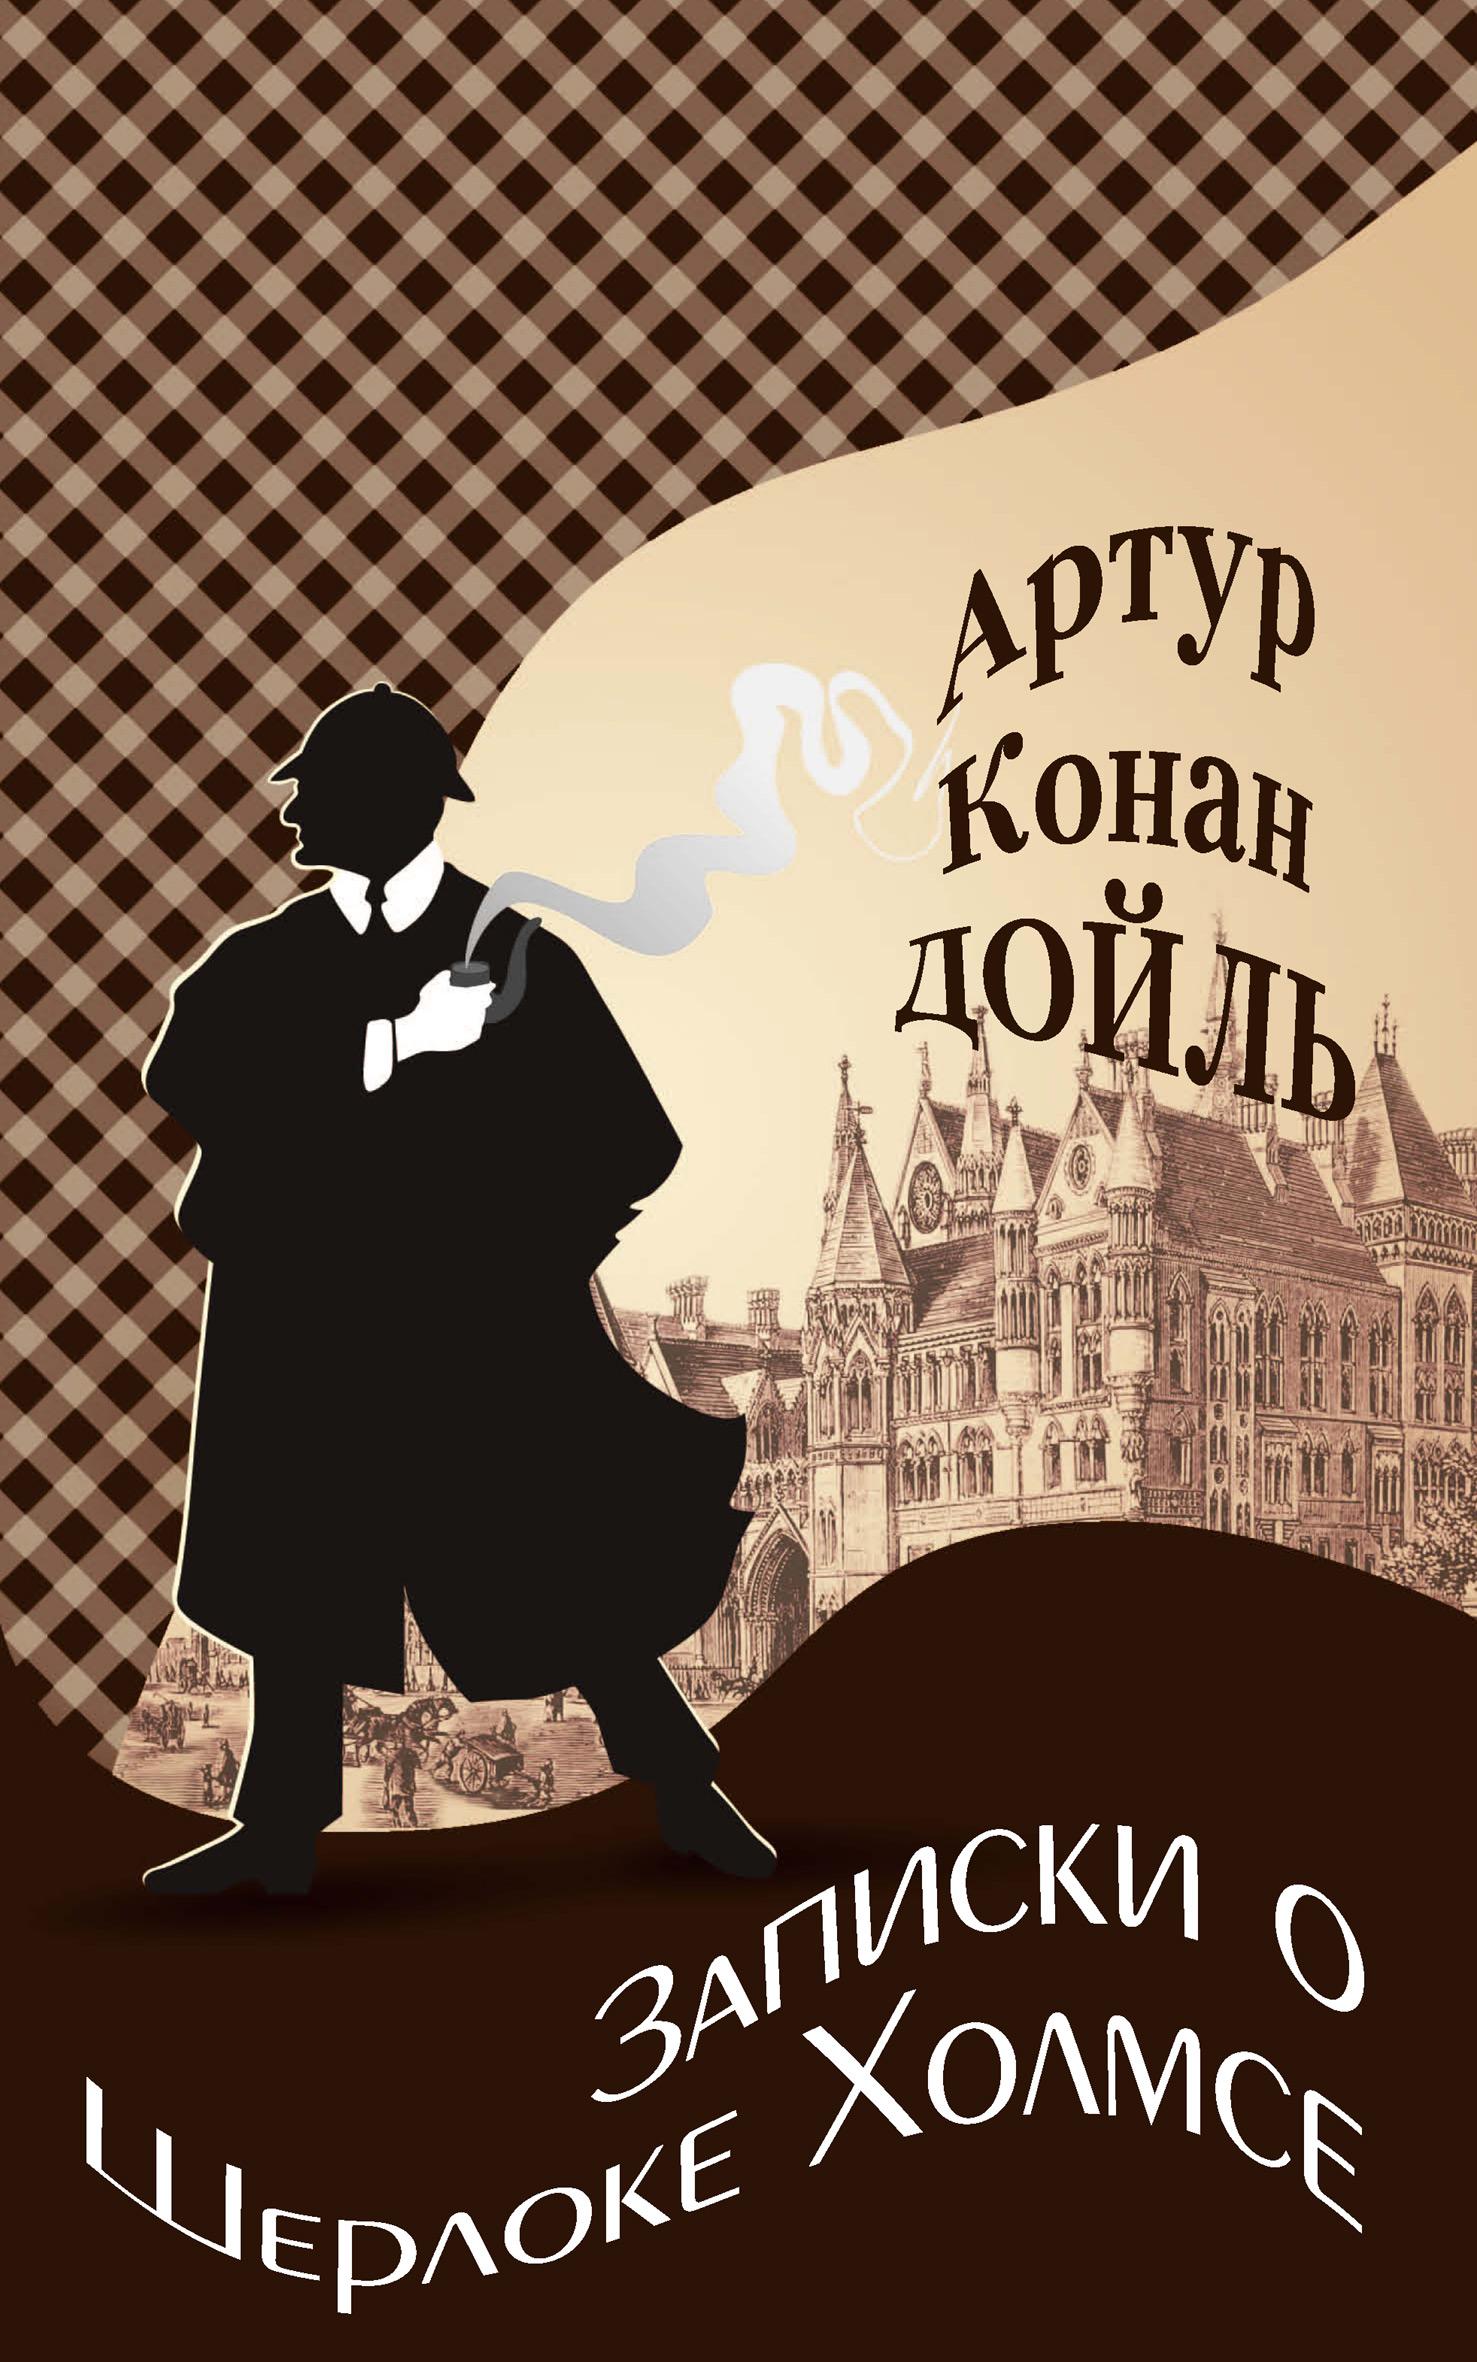 Артур Конан Дойл Записки о Шерлоке Холмсе артур конан дойл все о шерлоке холмсе комплект из 6 аудиокниг mp3